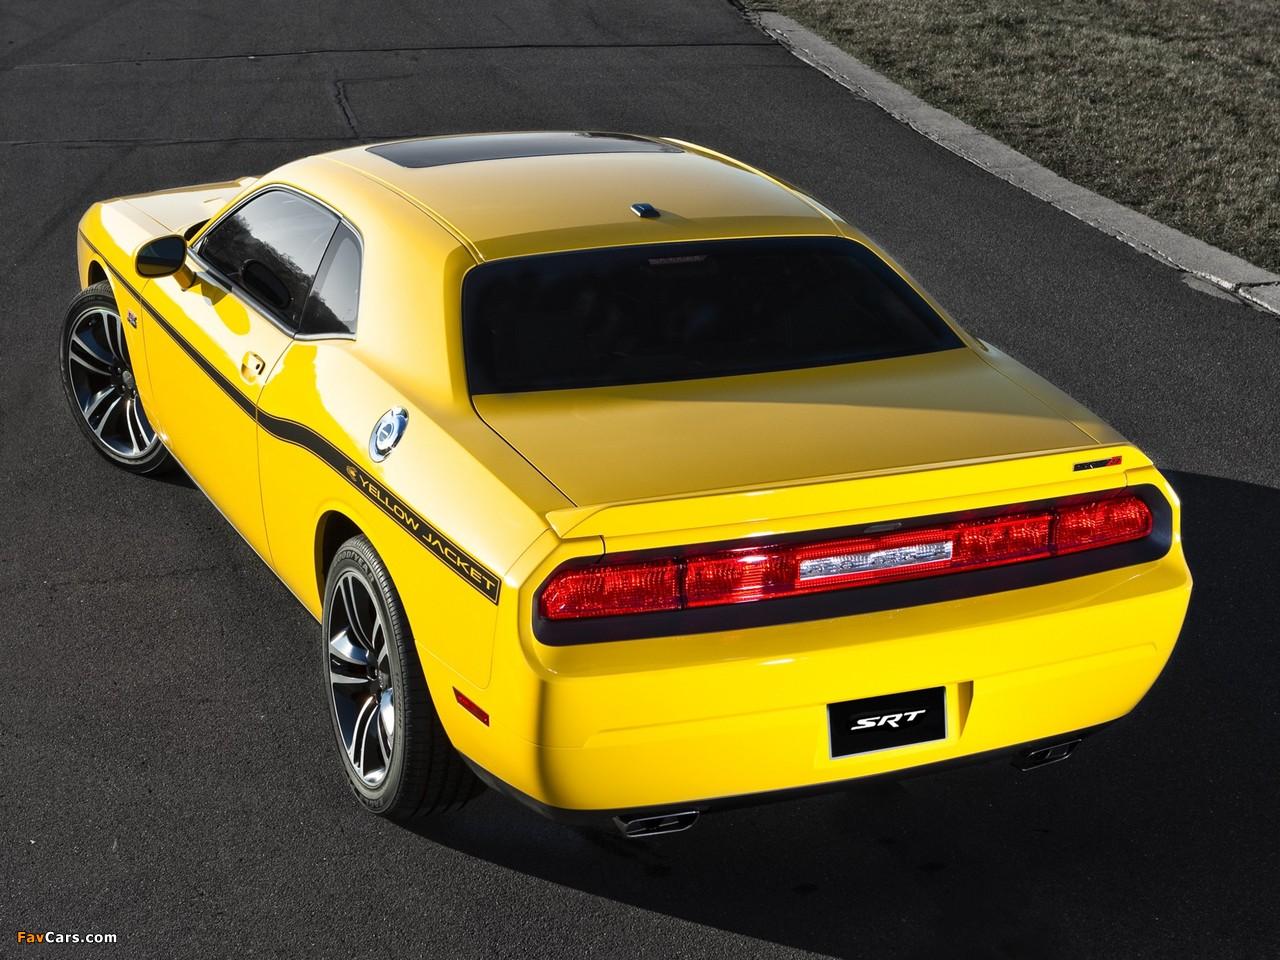 Dodge Challenger SRT8 392 Yellow Jacket (LC) 2012 photos (1280 x 960)